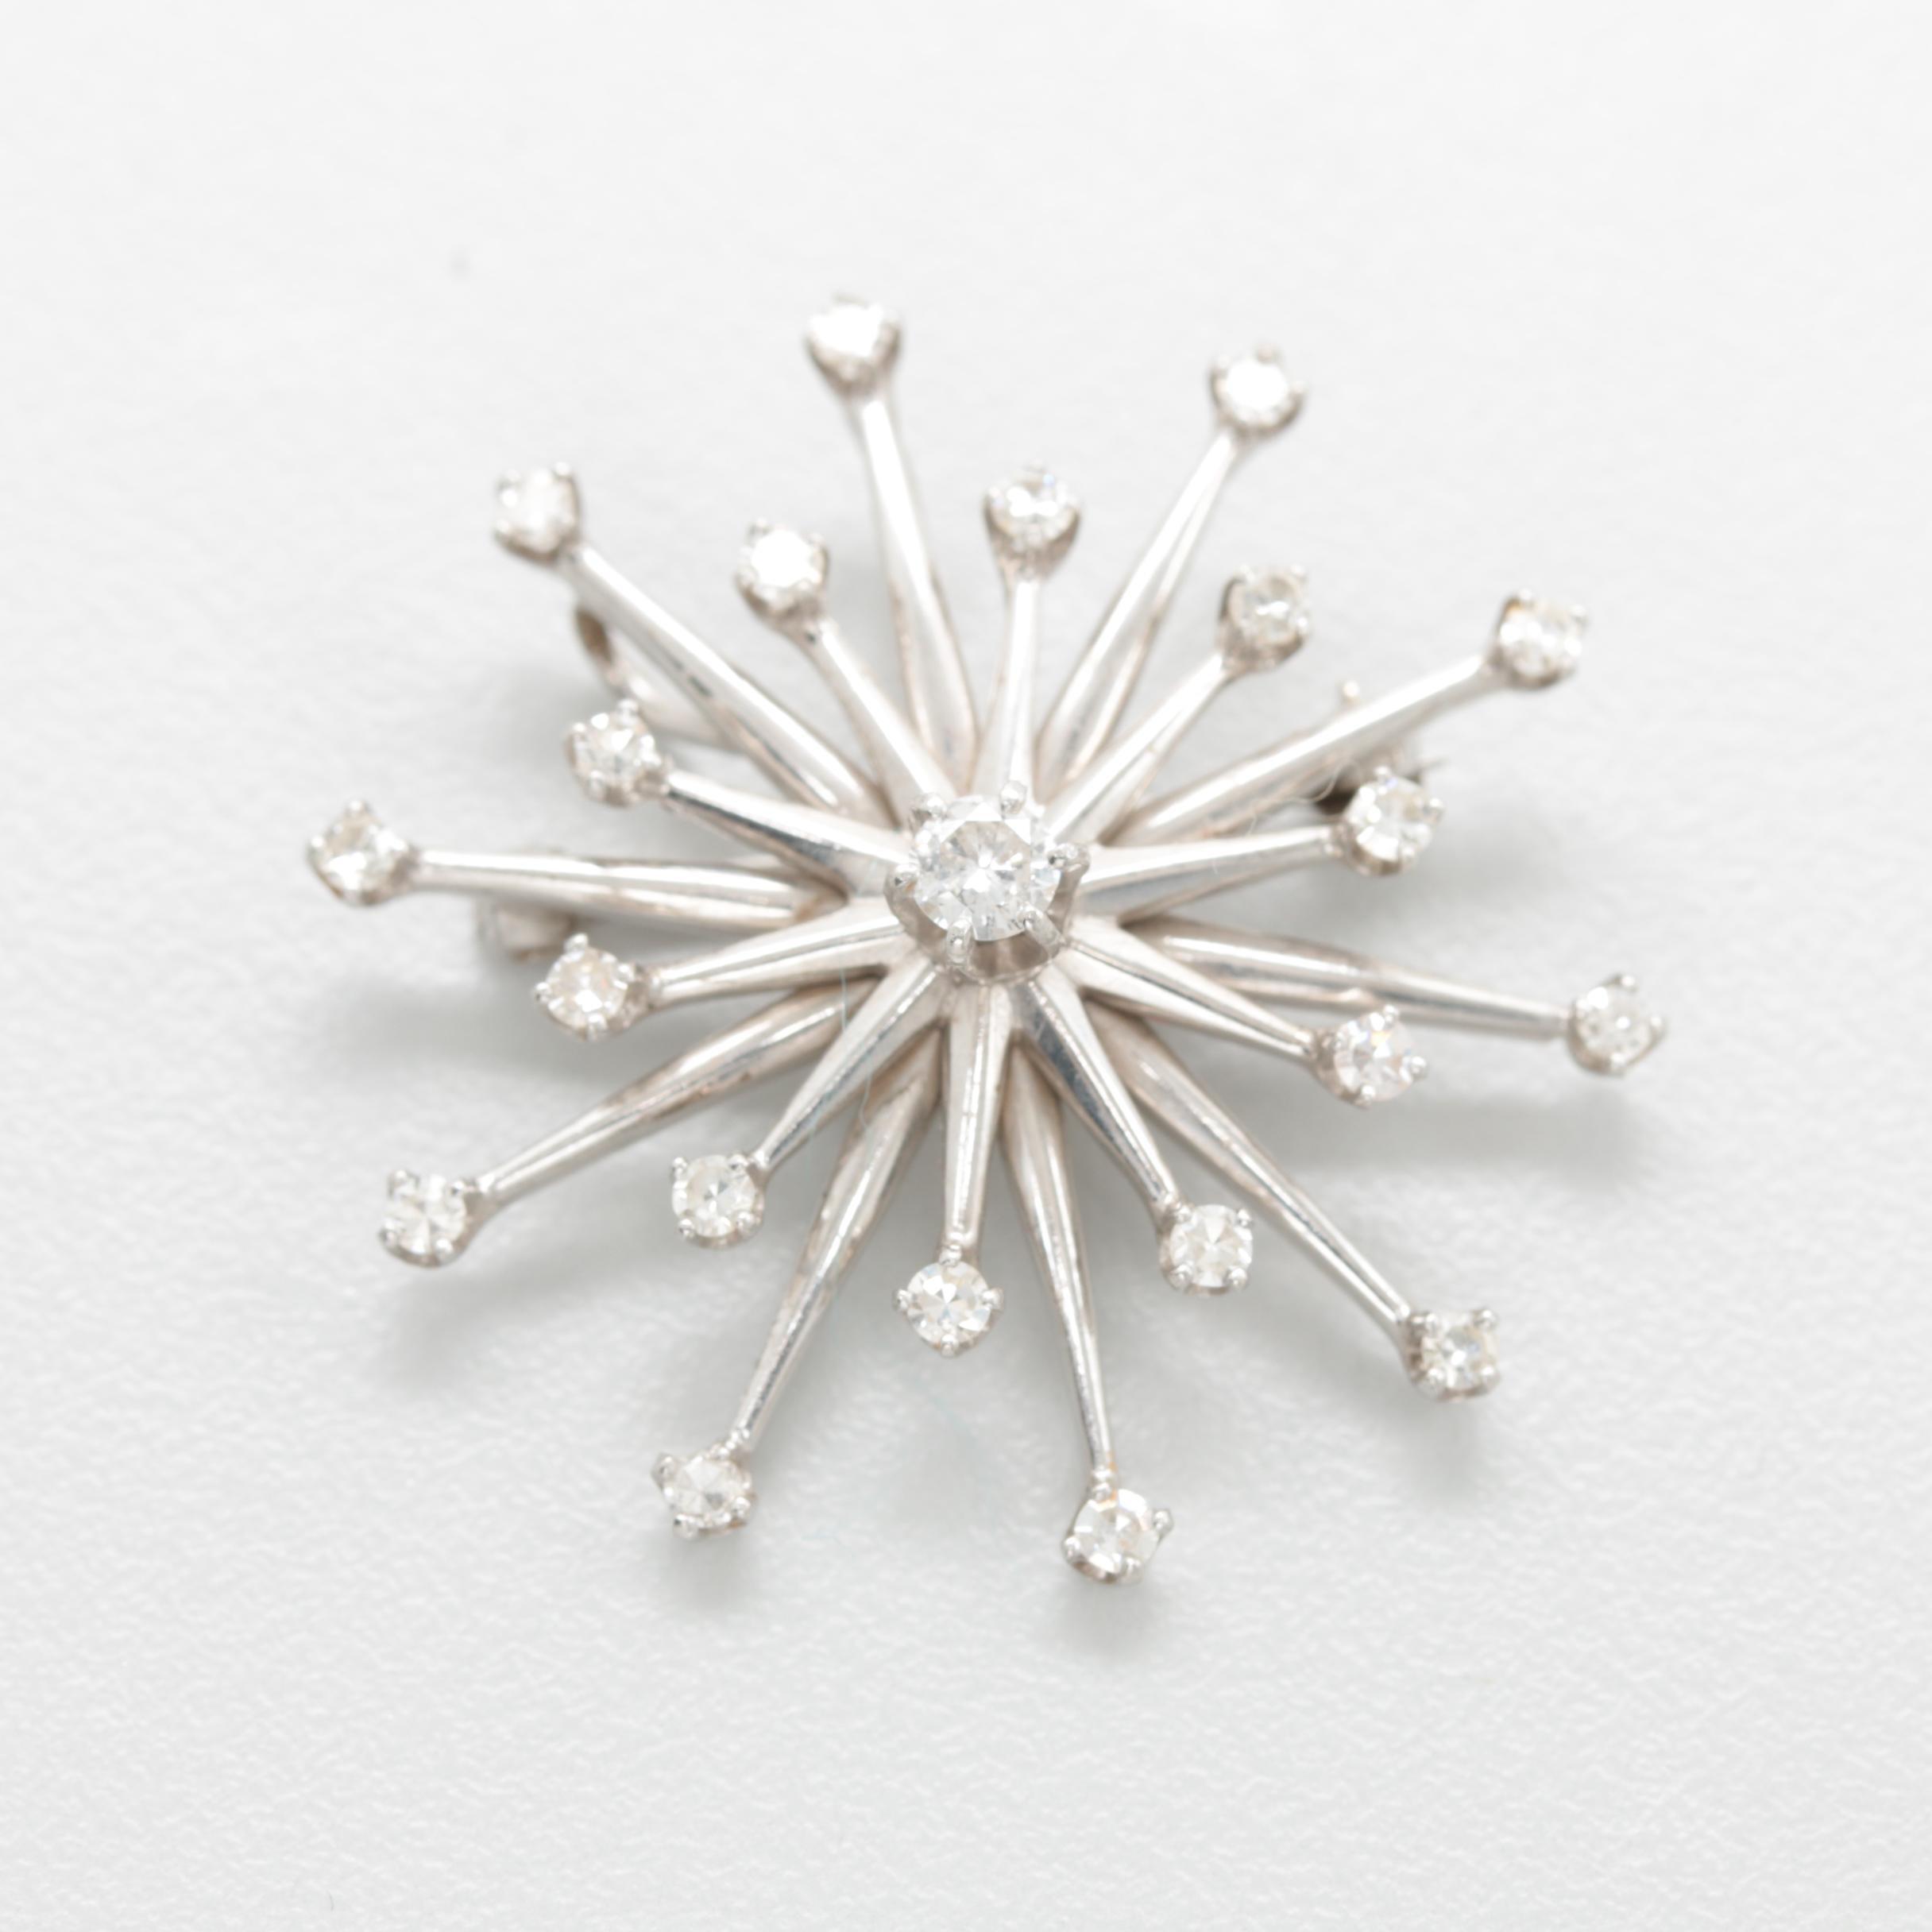 14K White Gold Diamond Star Motif Converter Brooch with Palladium Accents